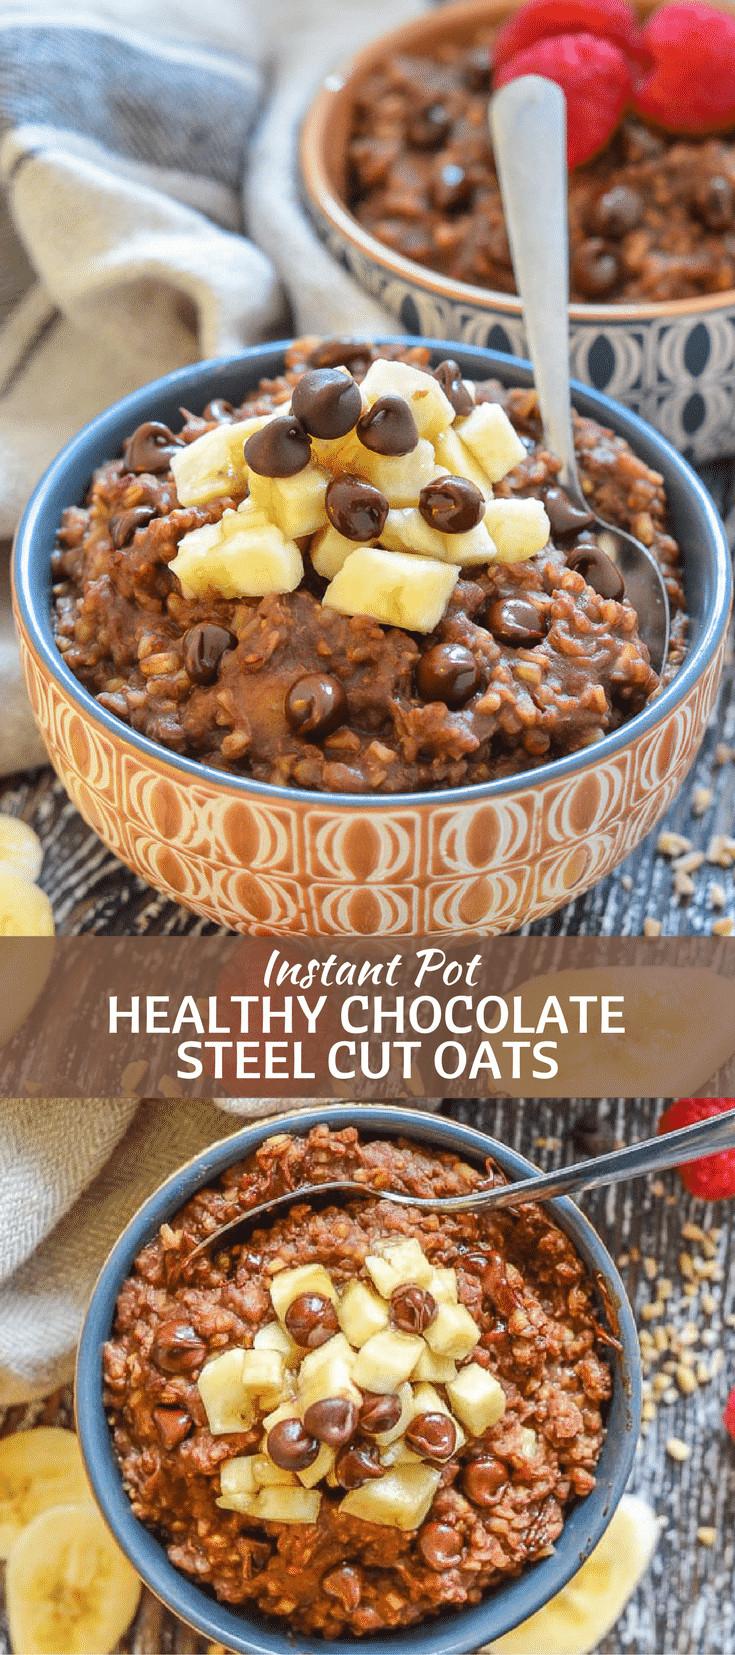 Steel Cut Oats Healthy  Healthy Chocolate Instant Pot Steel Cut Oats A Virtual Vegan